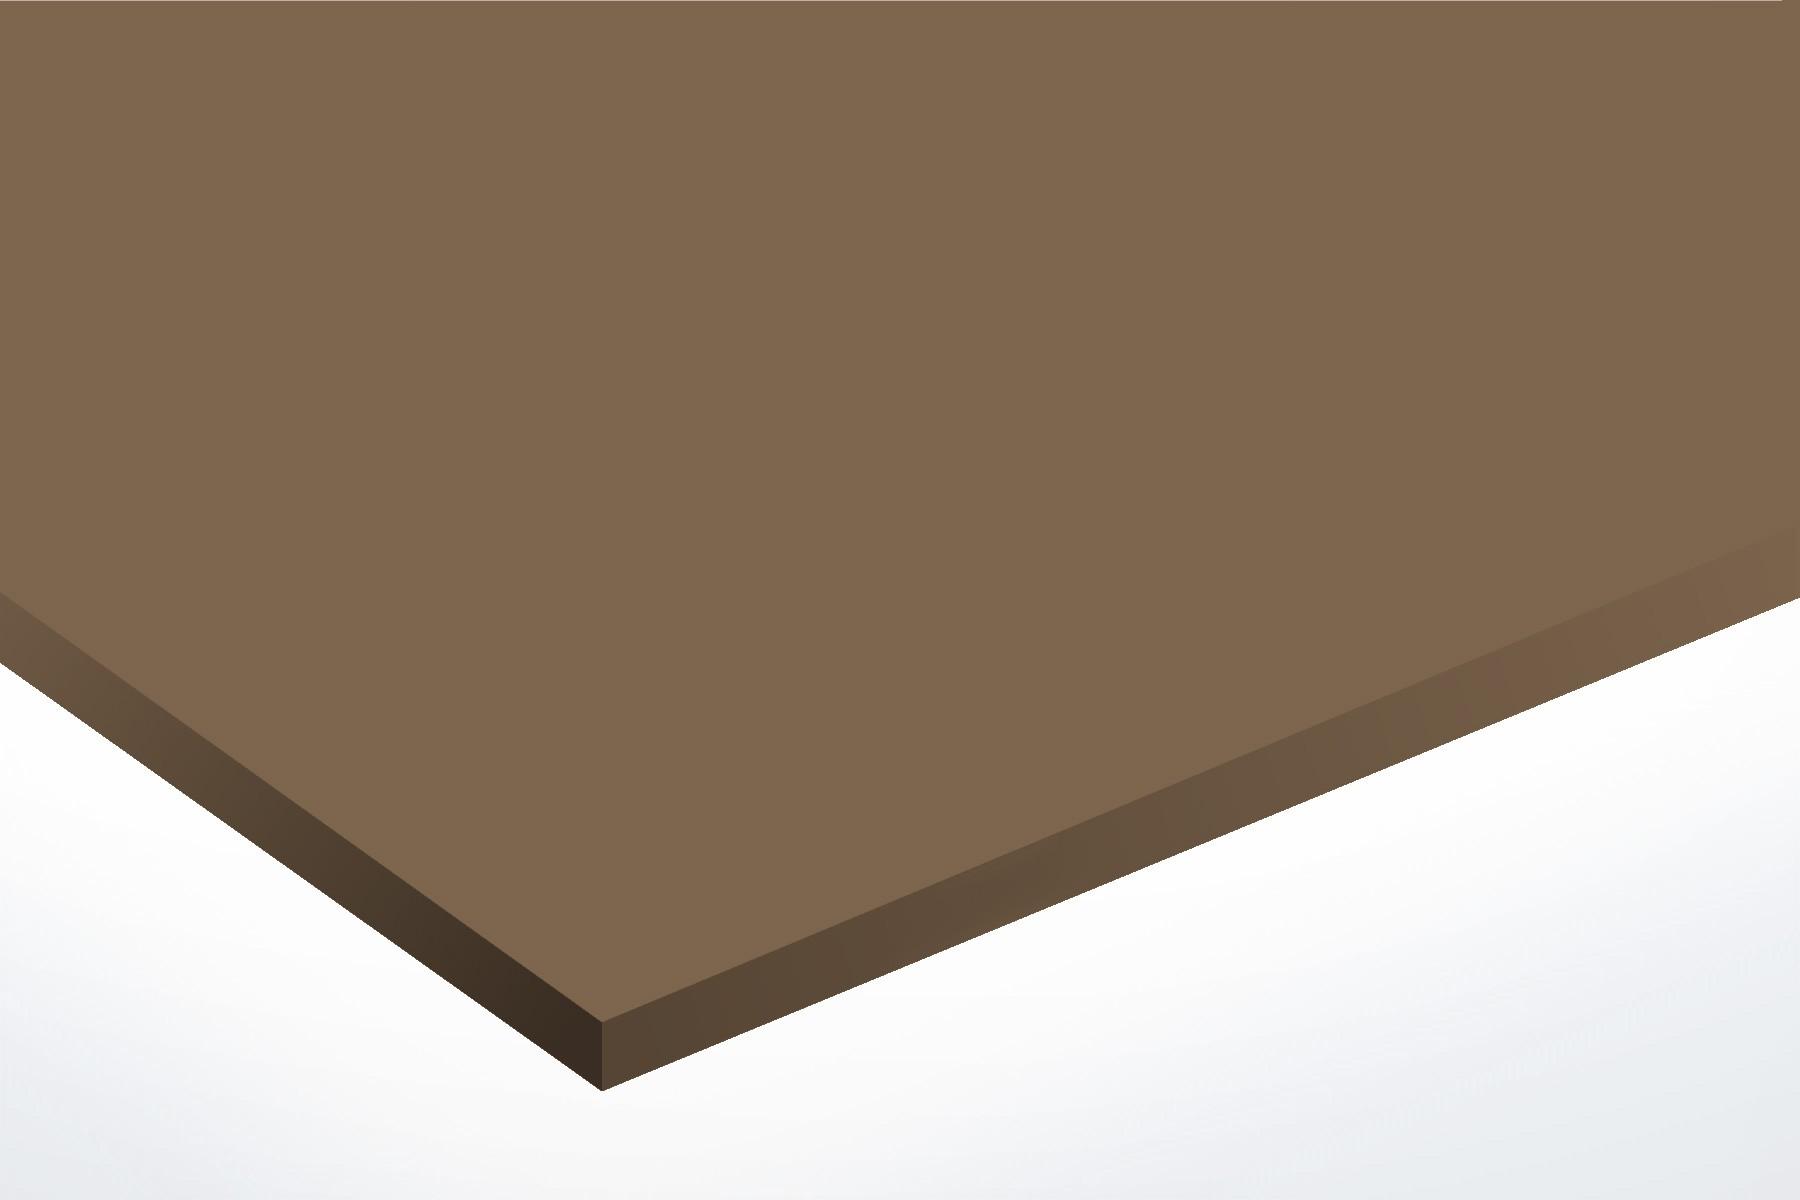 Anodised Aluminium Bronze, Matte, 3mm x 1000mm x 500mm